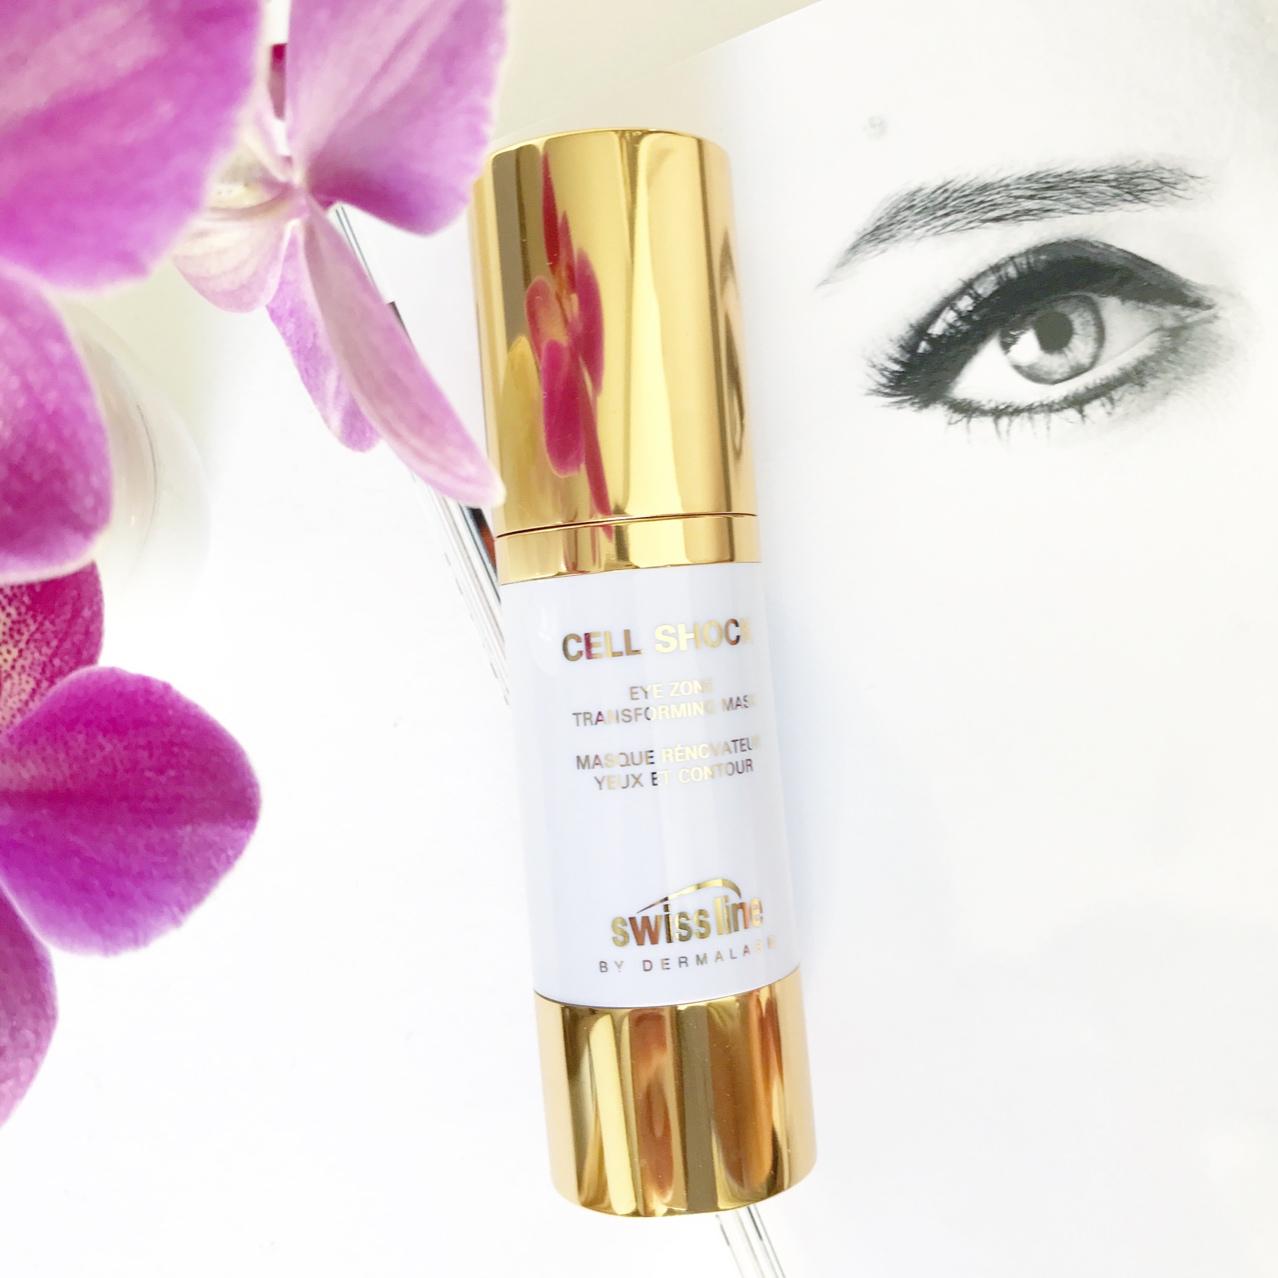 Swiss line cell shock маска для кожи вокруг глаз отзывы